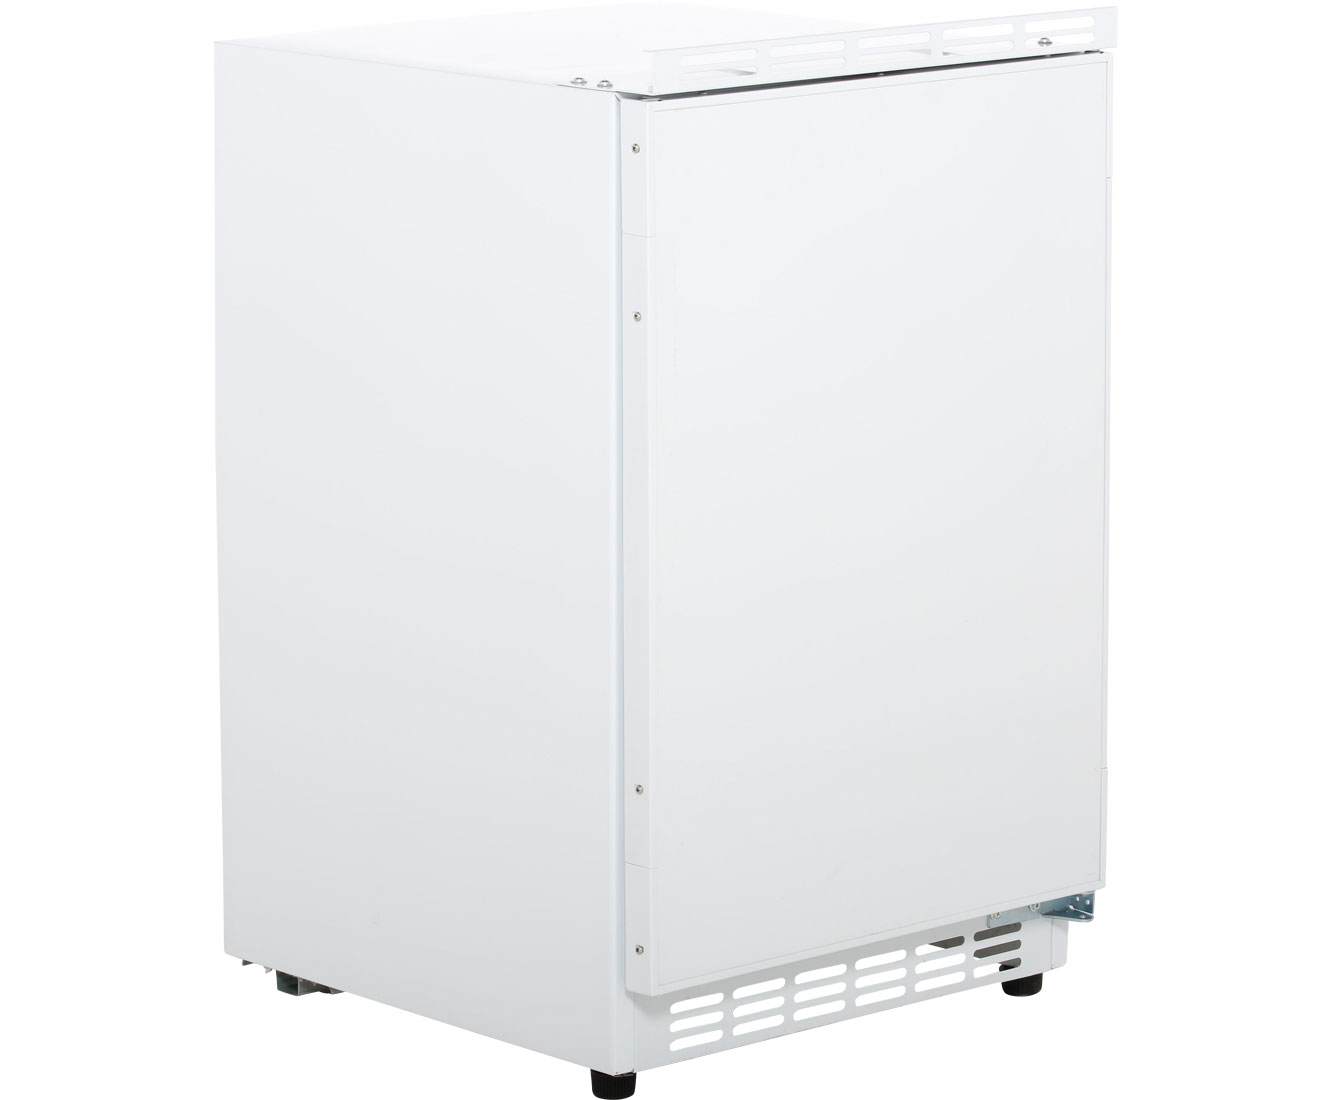 Amica Kühlschrank Produktion : Kühlschrank unterbau aeg sks58200f0 unterbau kühlschrank festtür 82 cm